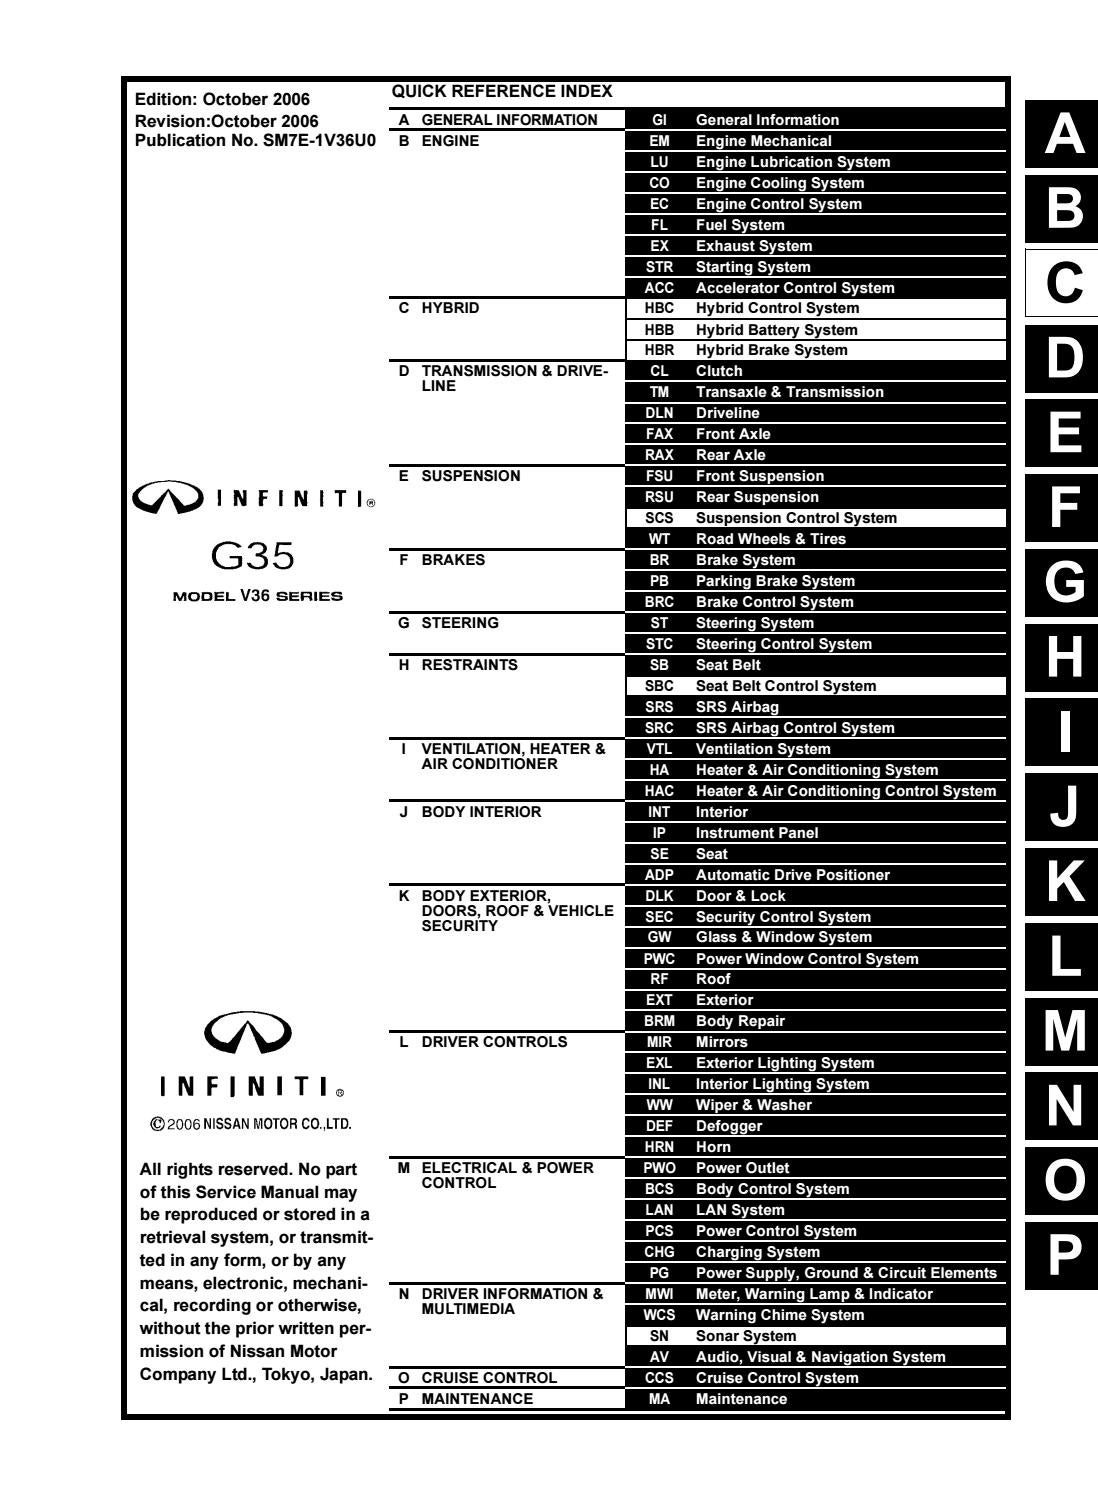 2007 INFINITI G35 SEDAN Service Repair Manual by 163215 - issuuIssuu